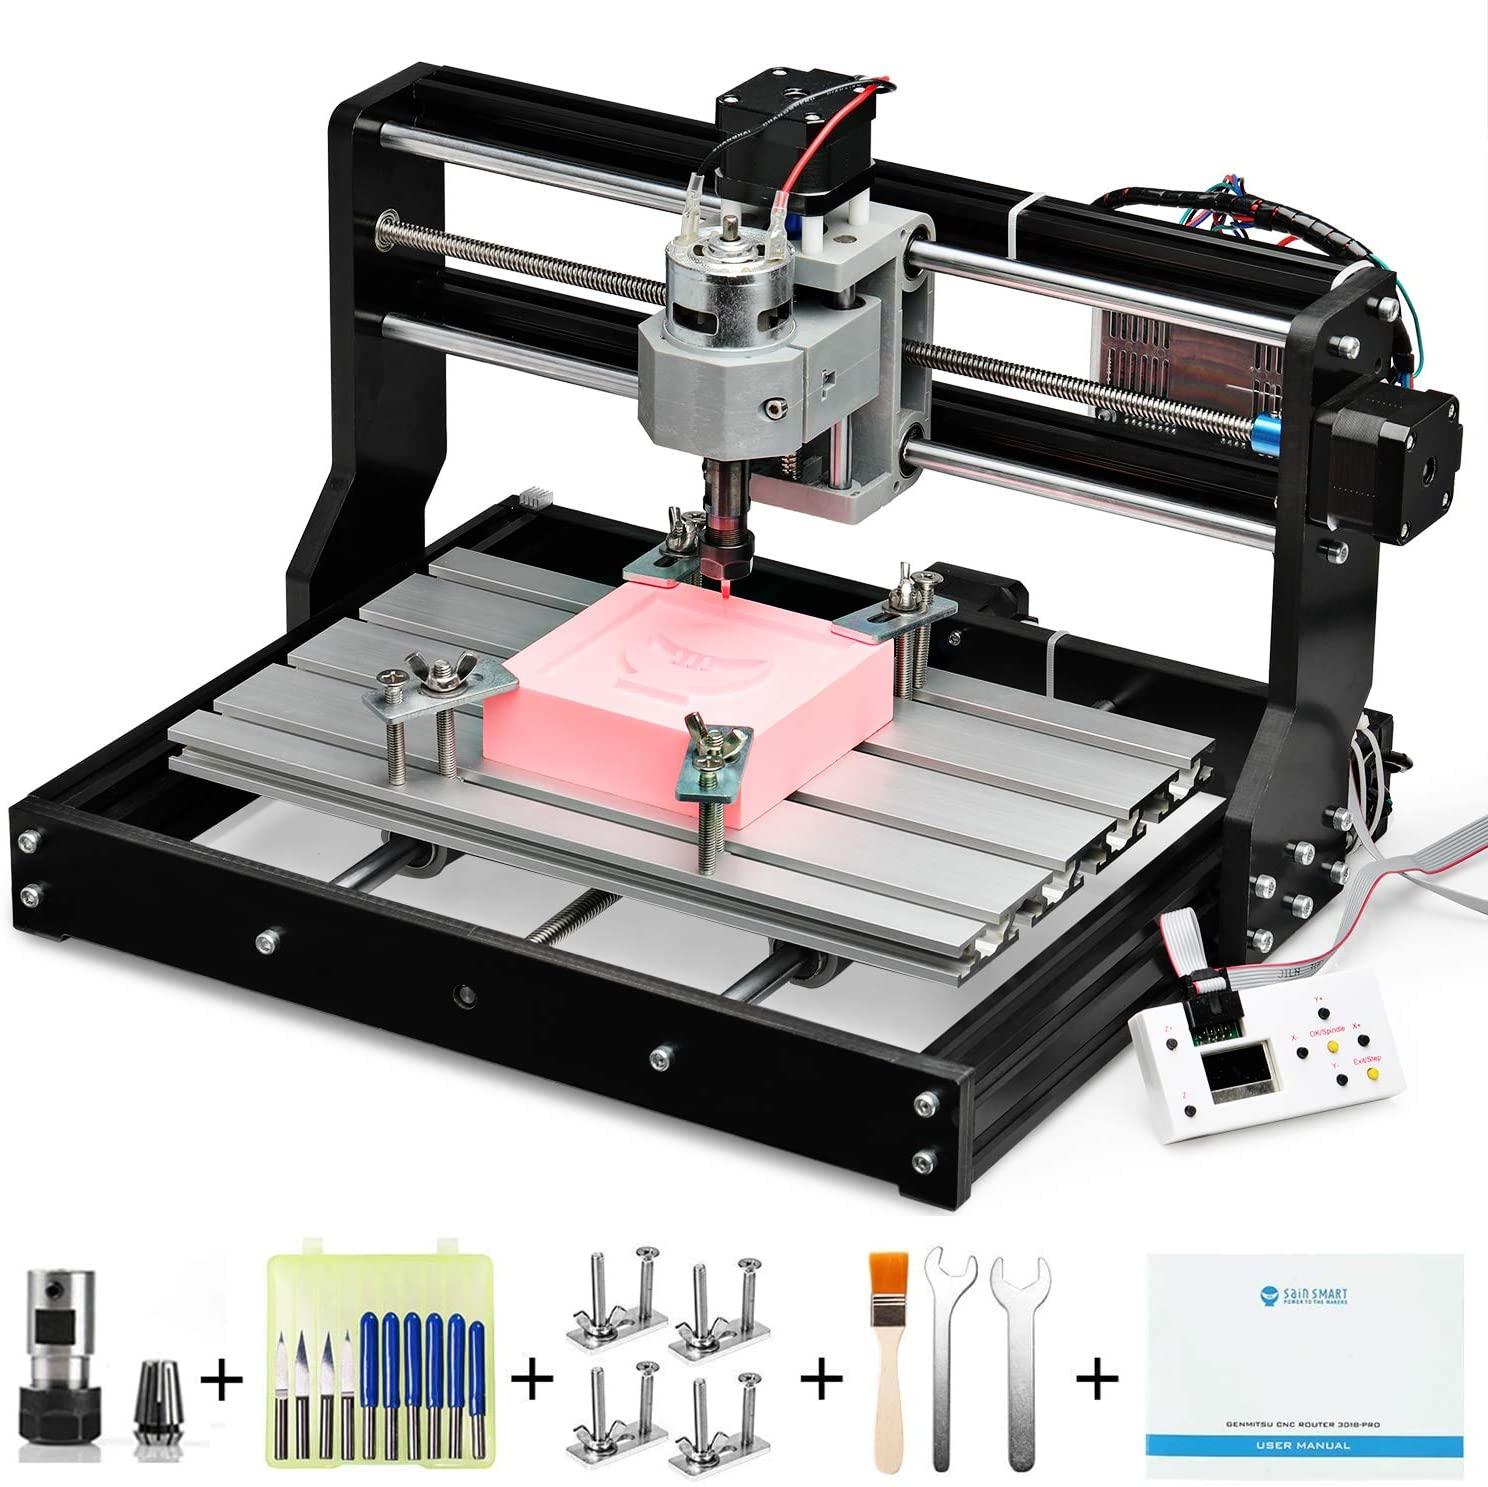 Genmitsu CNC Machine